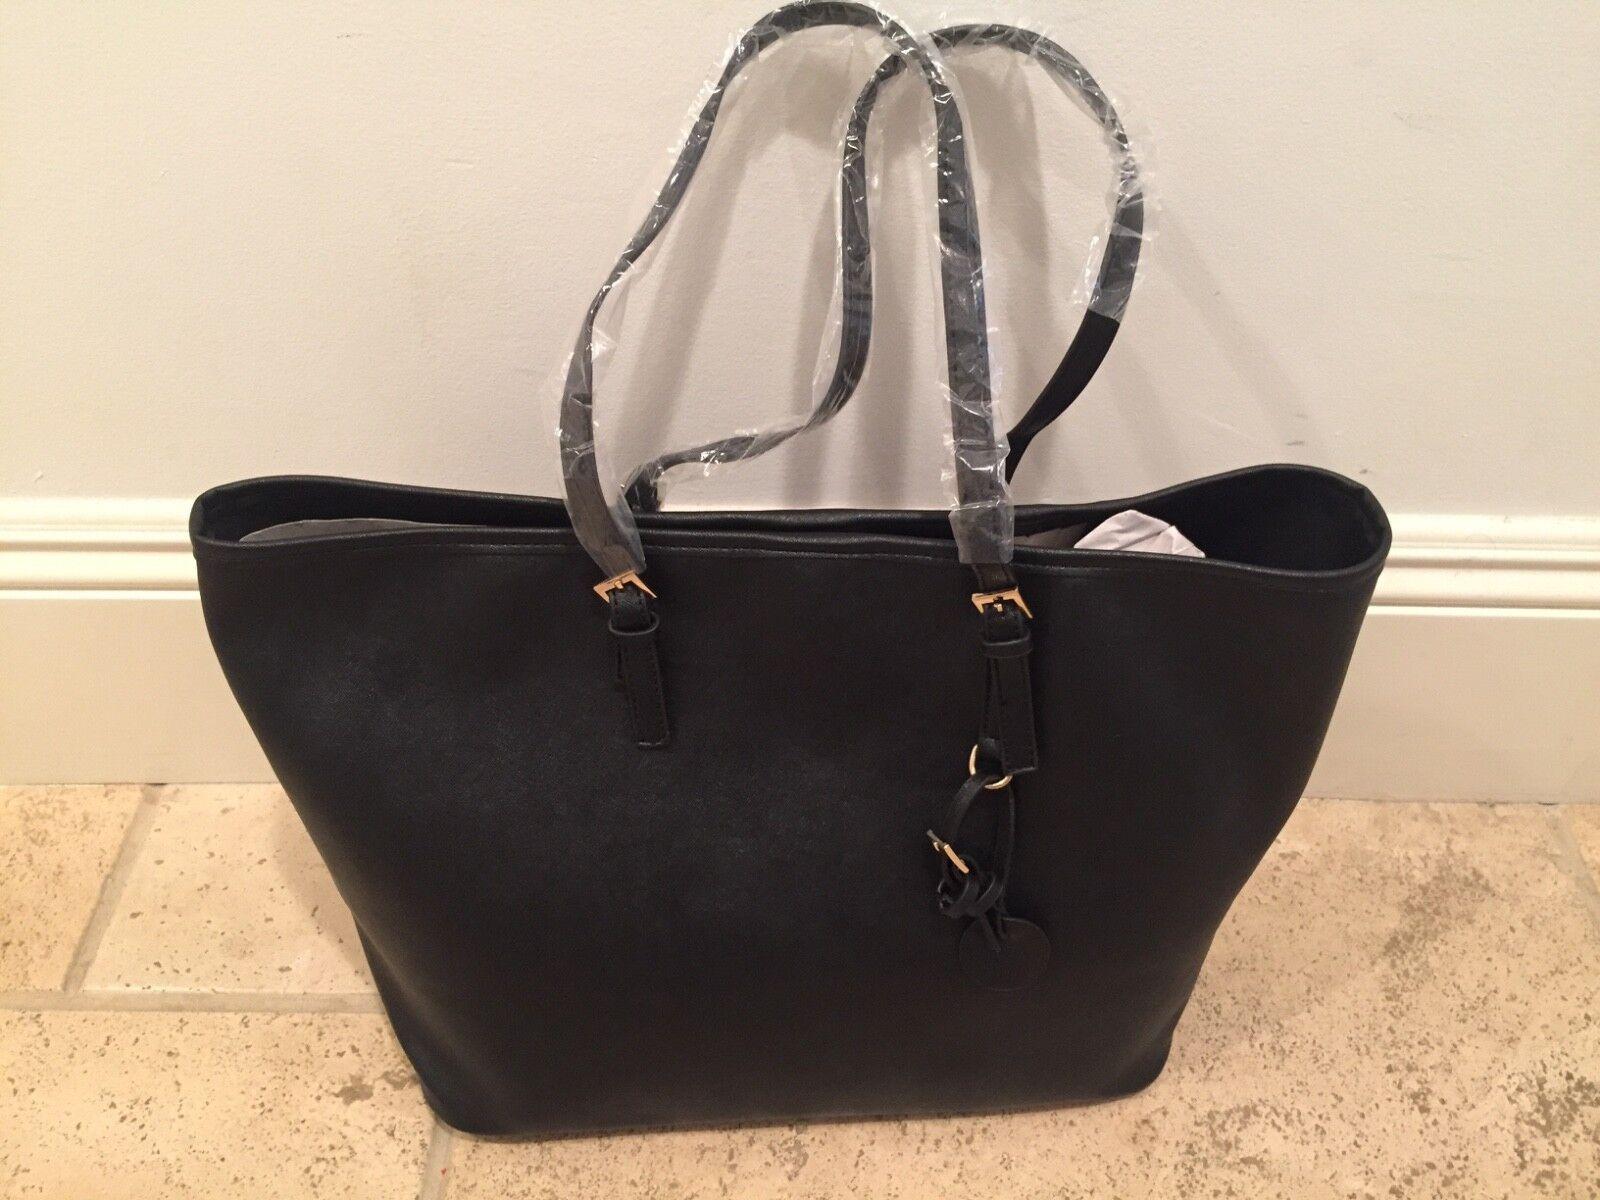 New Womans unbranded Black vegan leather tote handbag